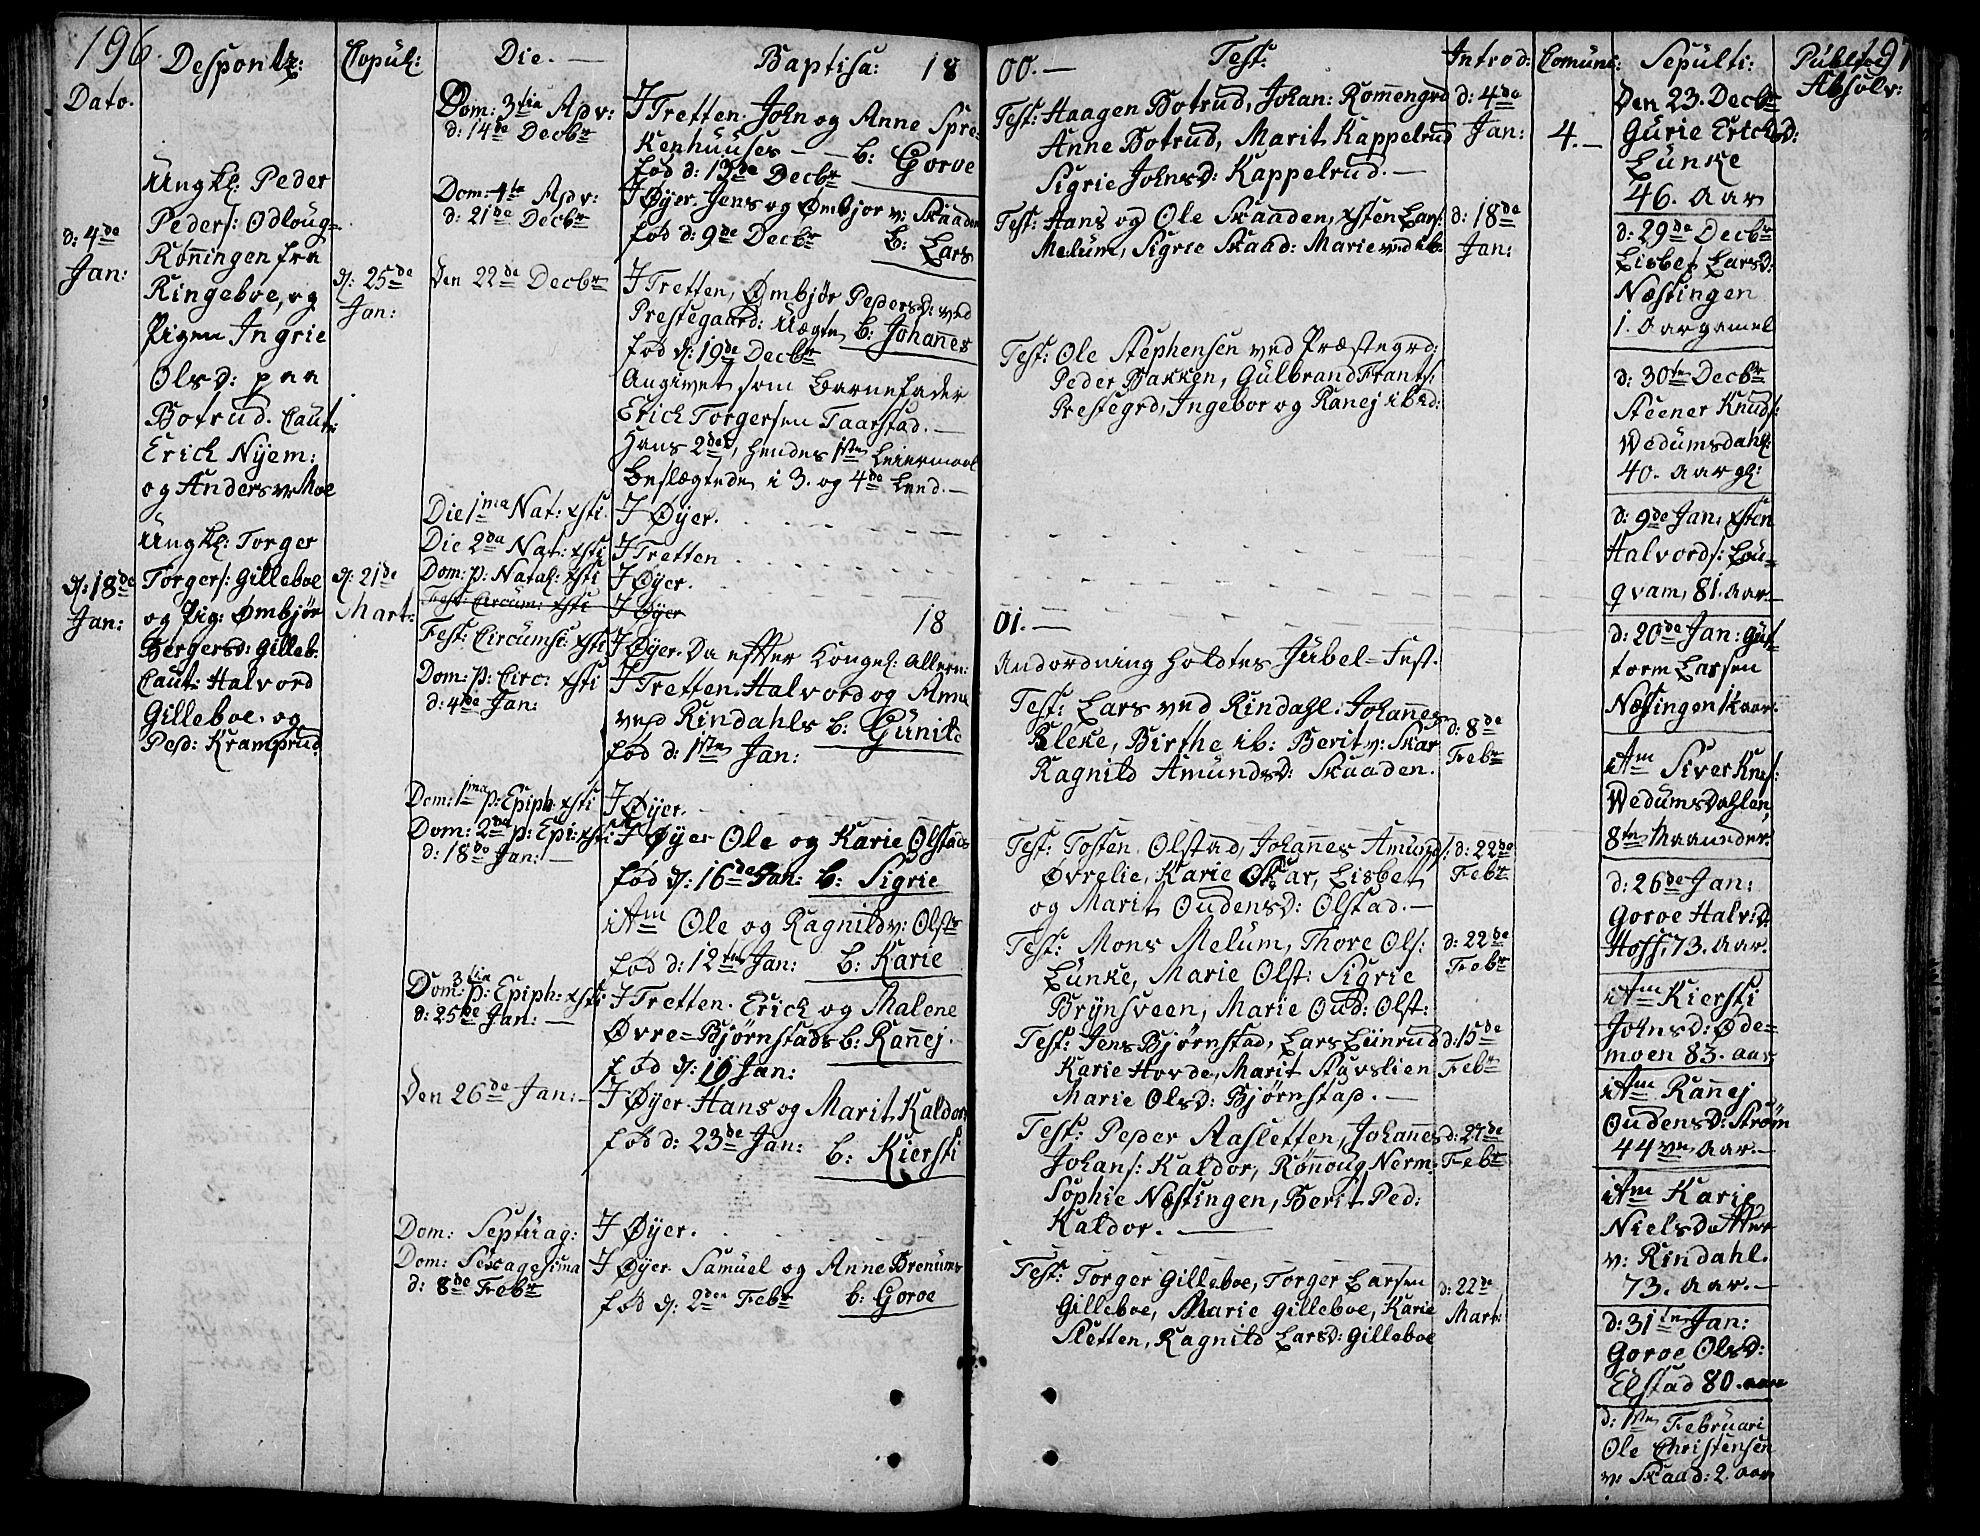 SAH, Øyer prestekontor, Ministerialbok nr. 3, 1784-1824, s. 196-197